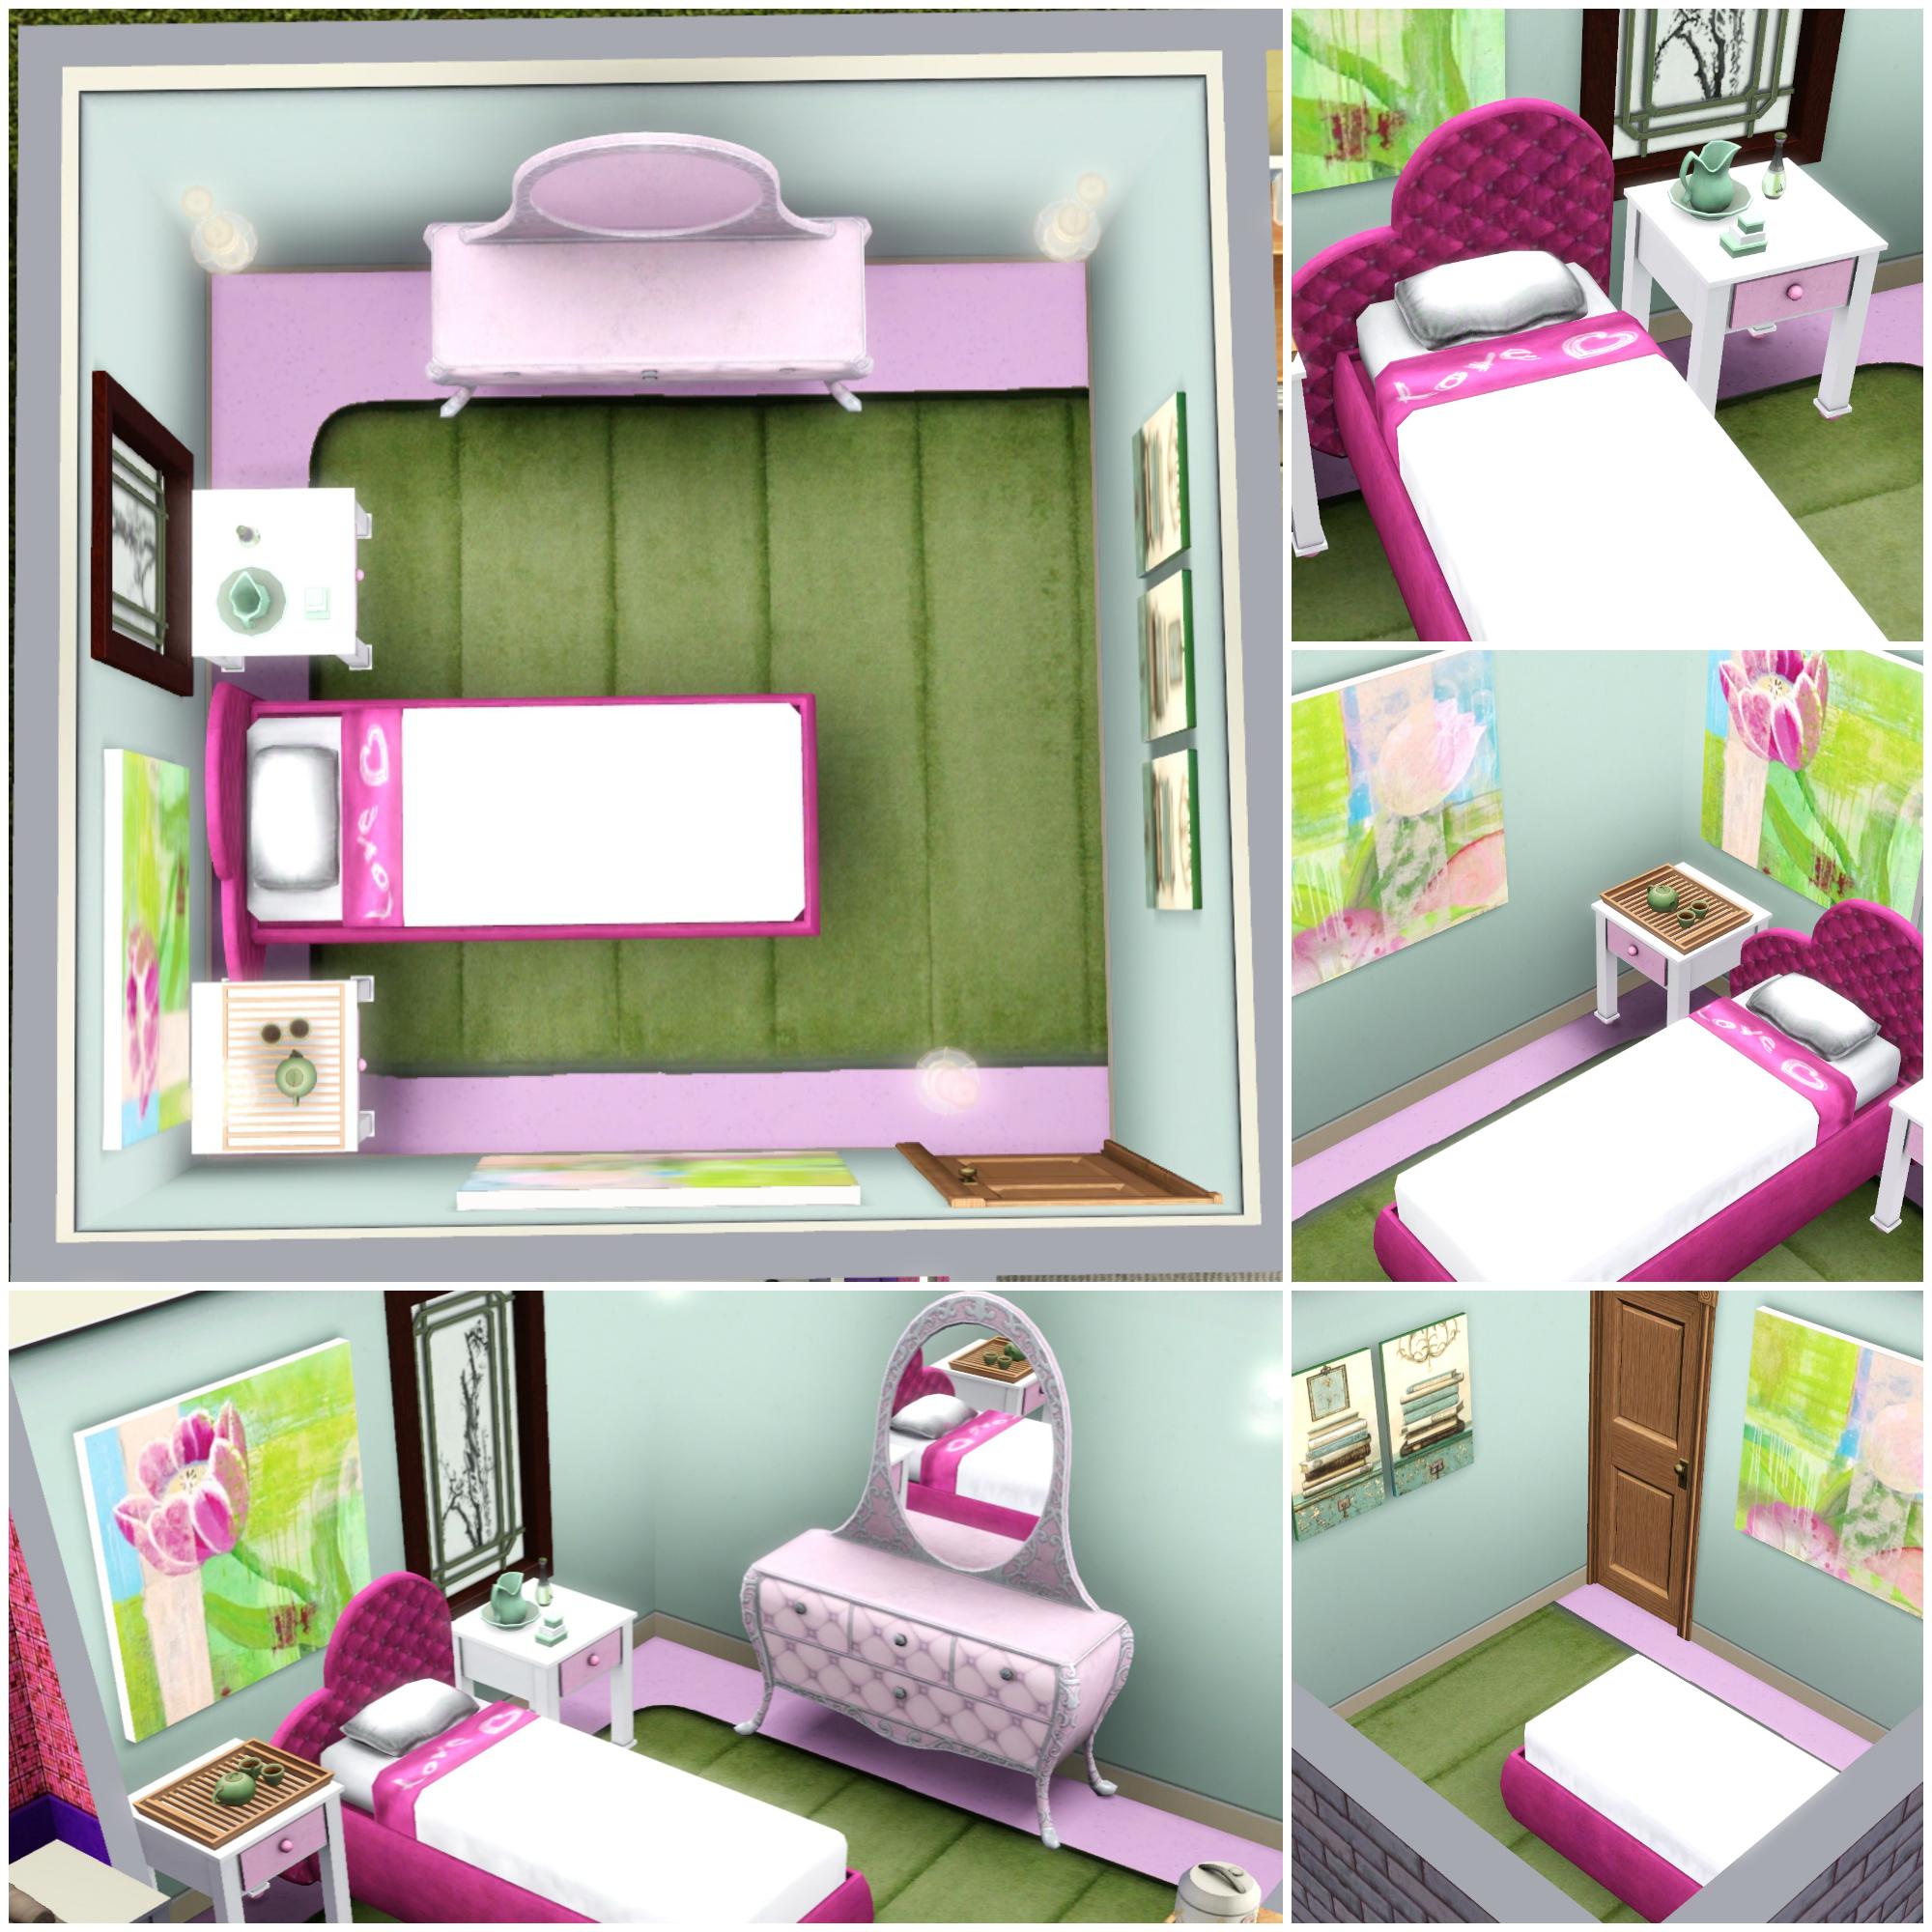 Dream Homes Assignments 21532414654_08eaf22bbd_o